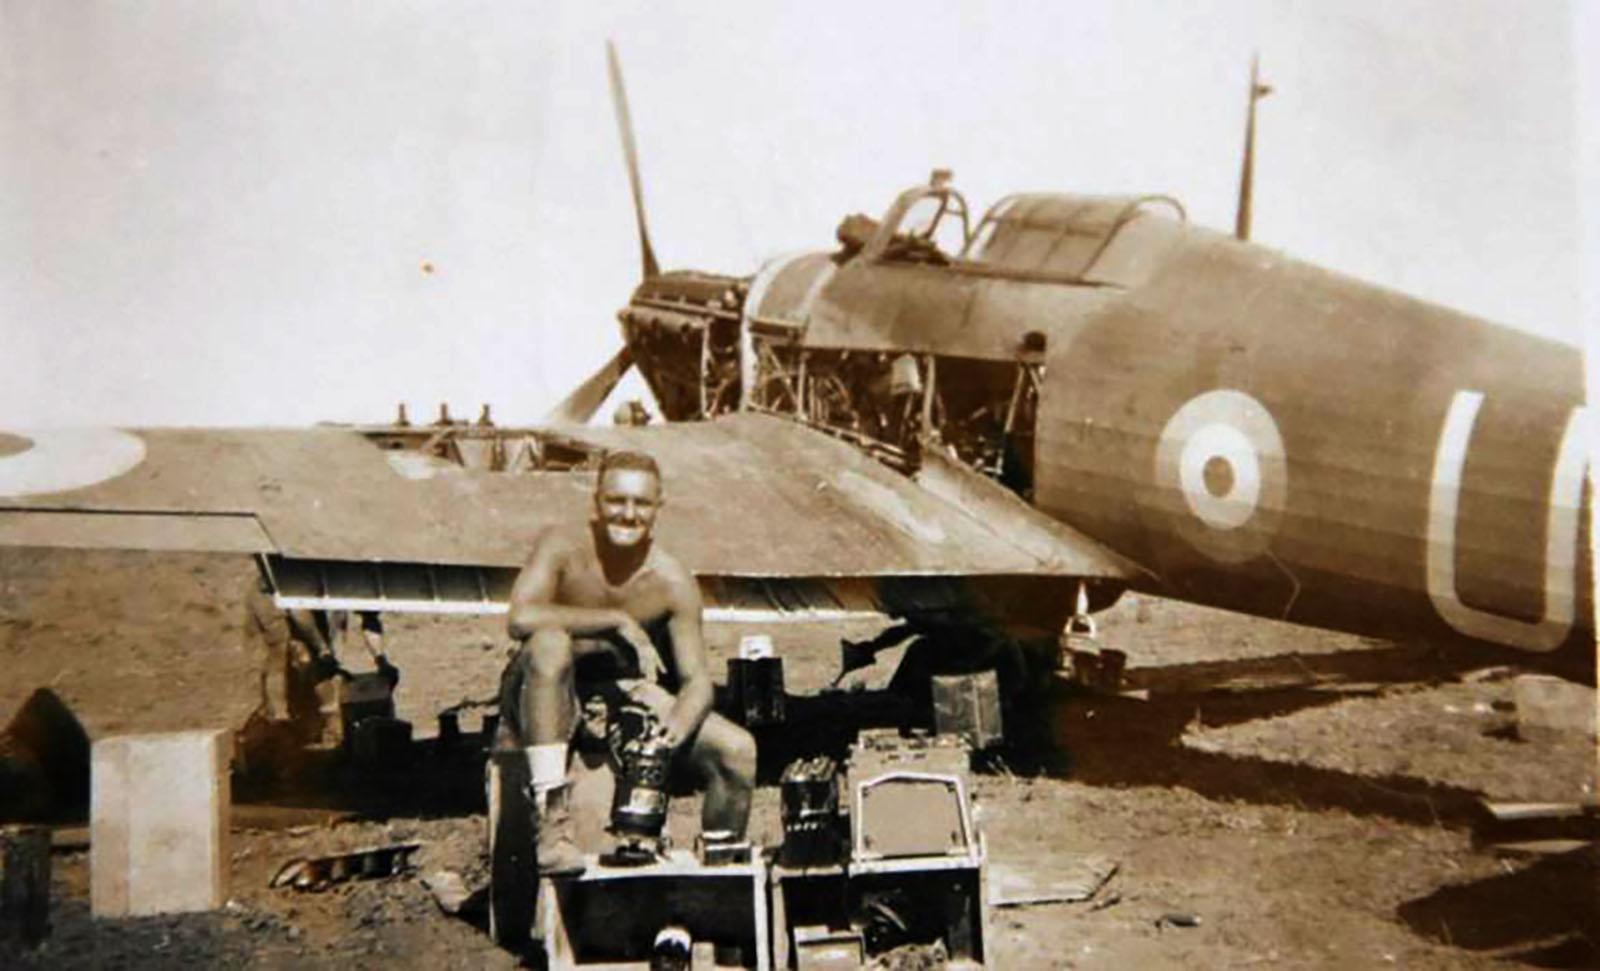 Hurricane I Trop SAAF 3Sqn U Bob Kershaw Dagahbur Ethiopia East Africa March 1941 03